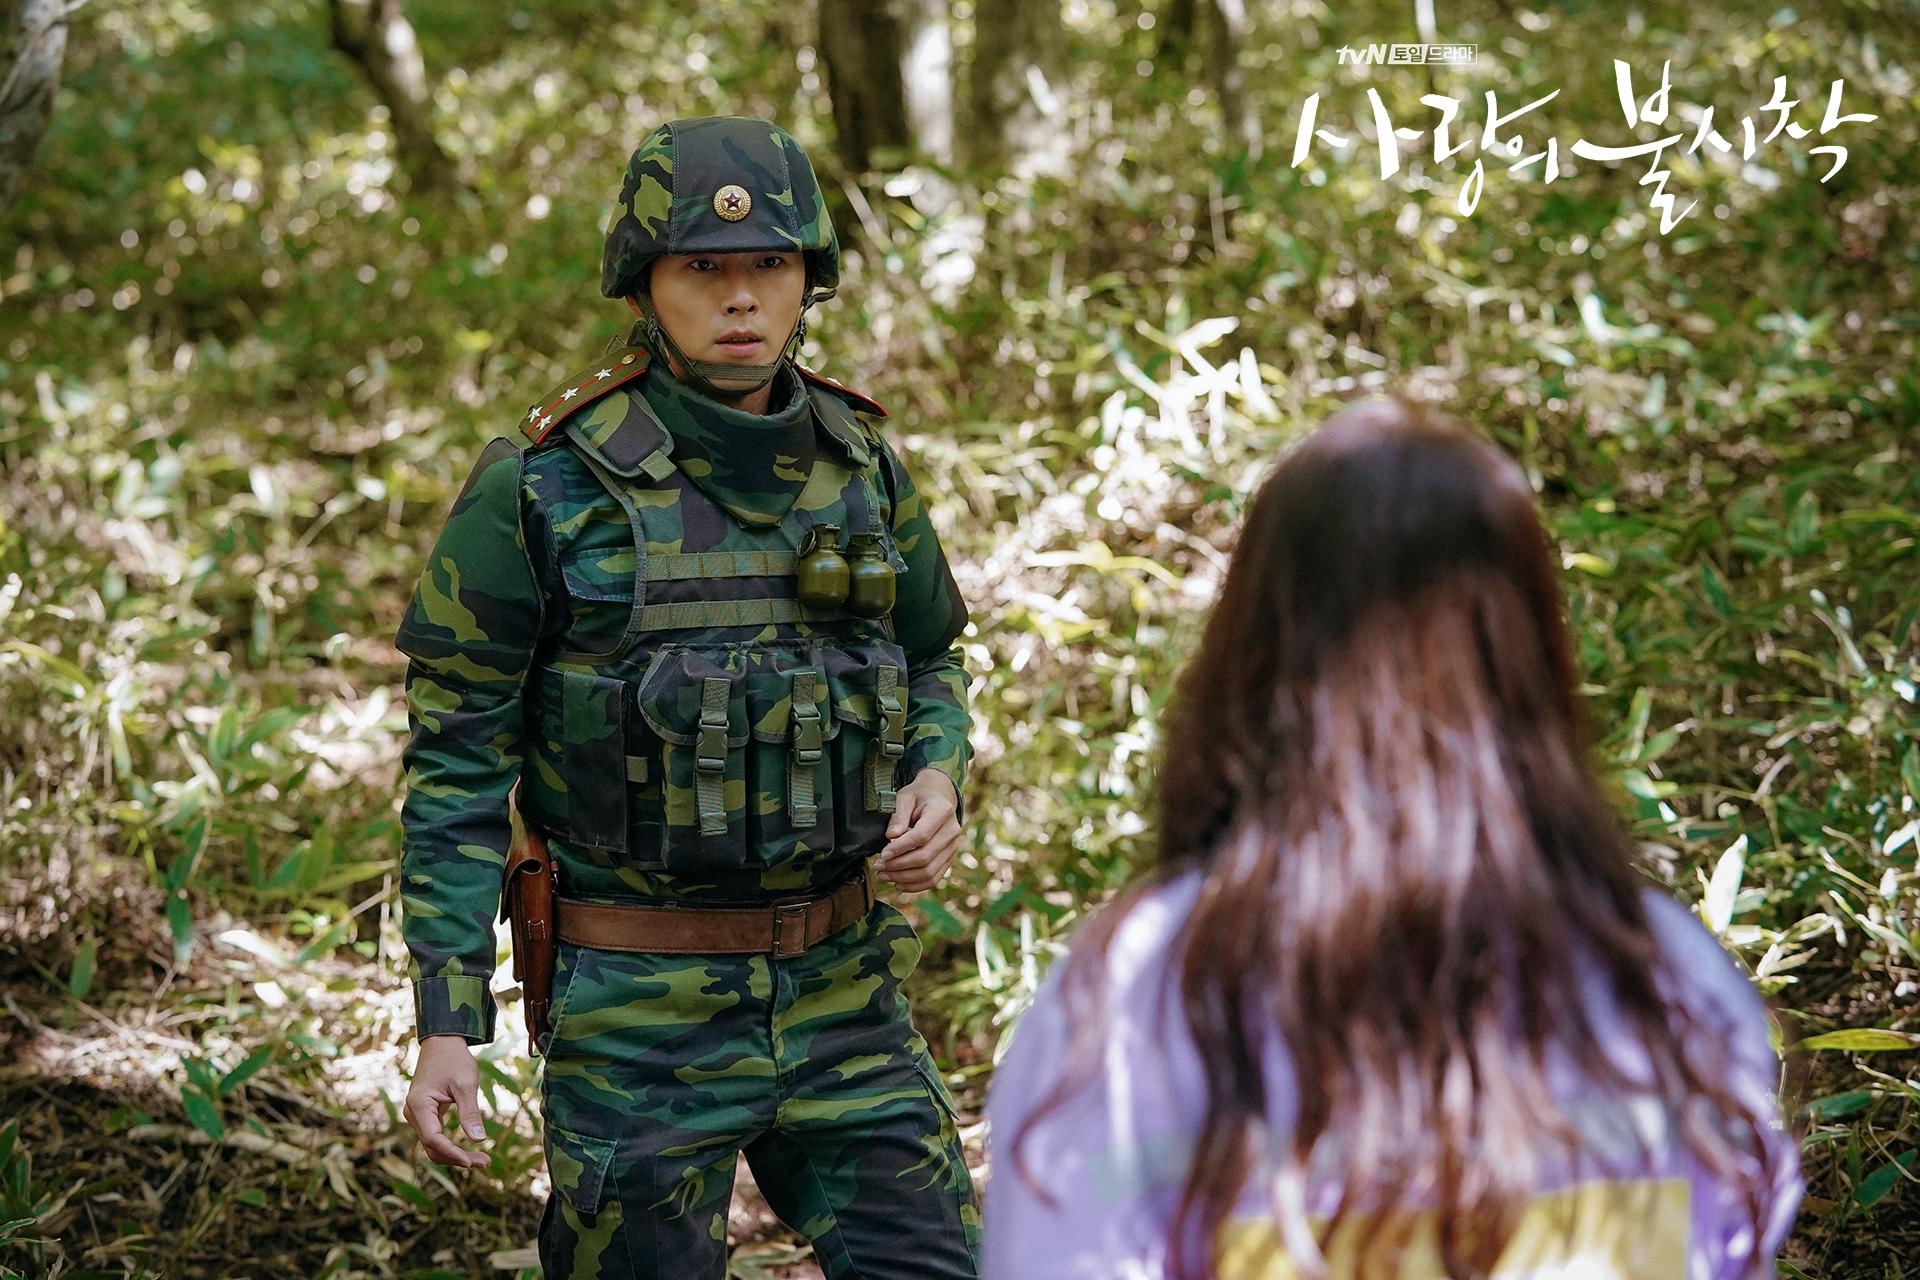 Crash Landing on You Yoon Se-ri and Captain Ri Jeong-hyeok minefield